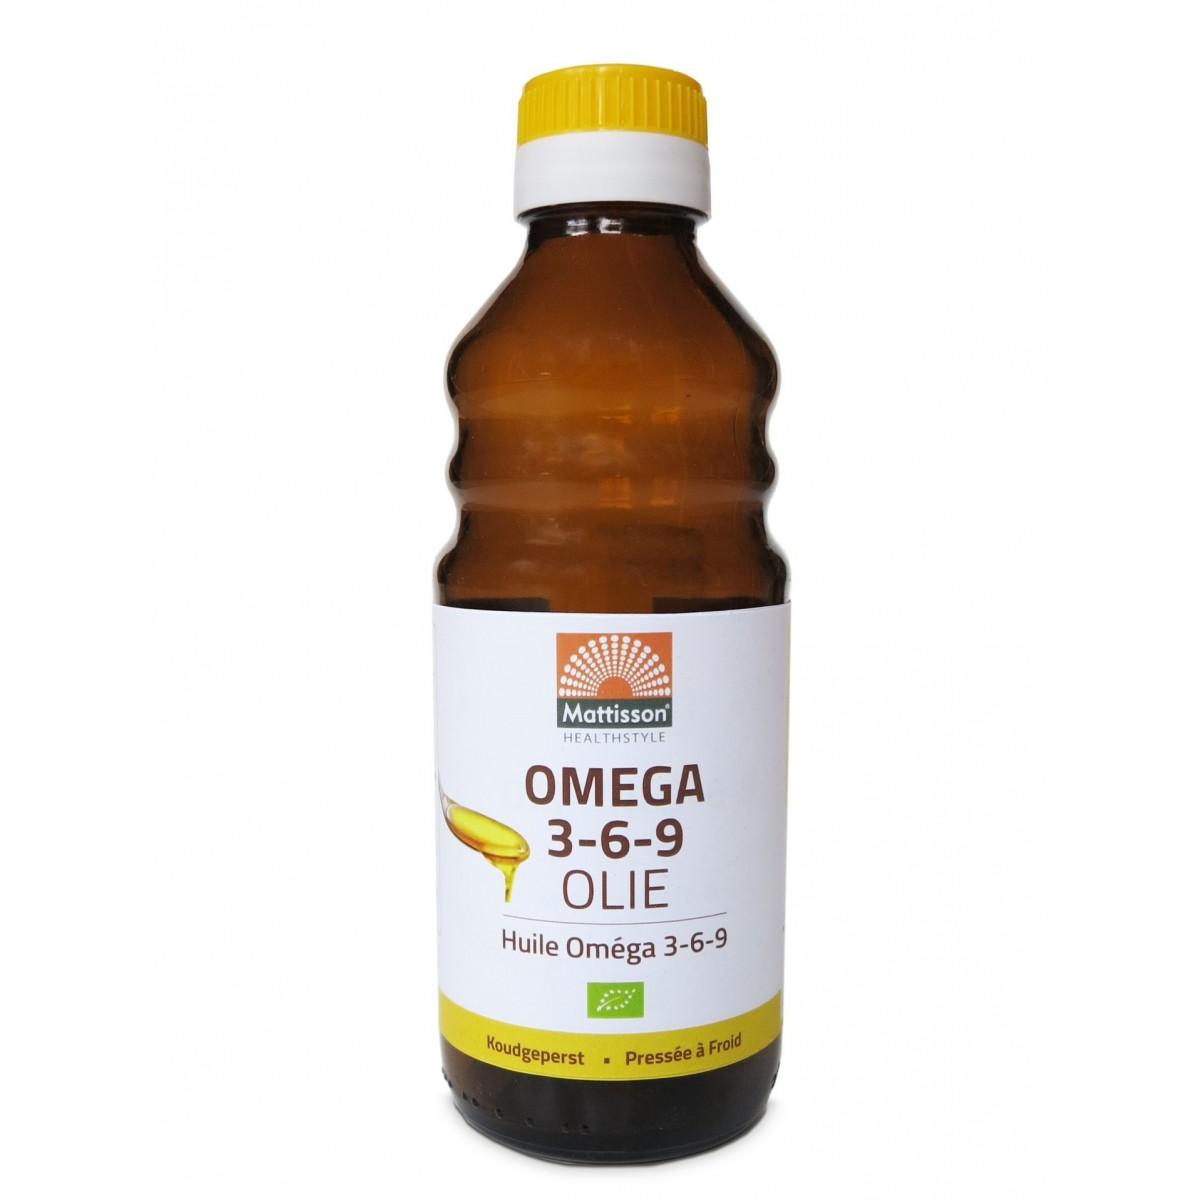 Omega 3-6-9 Olie